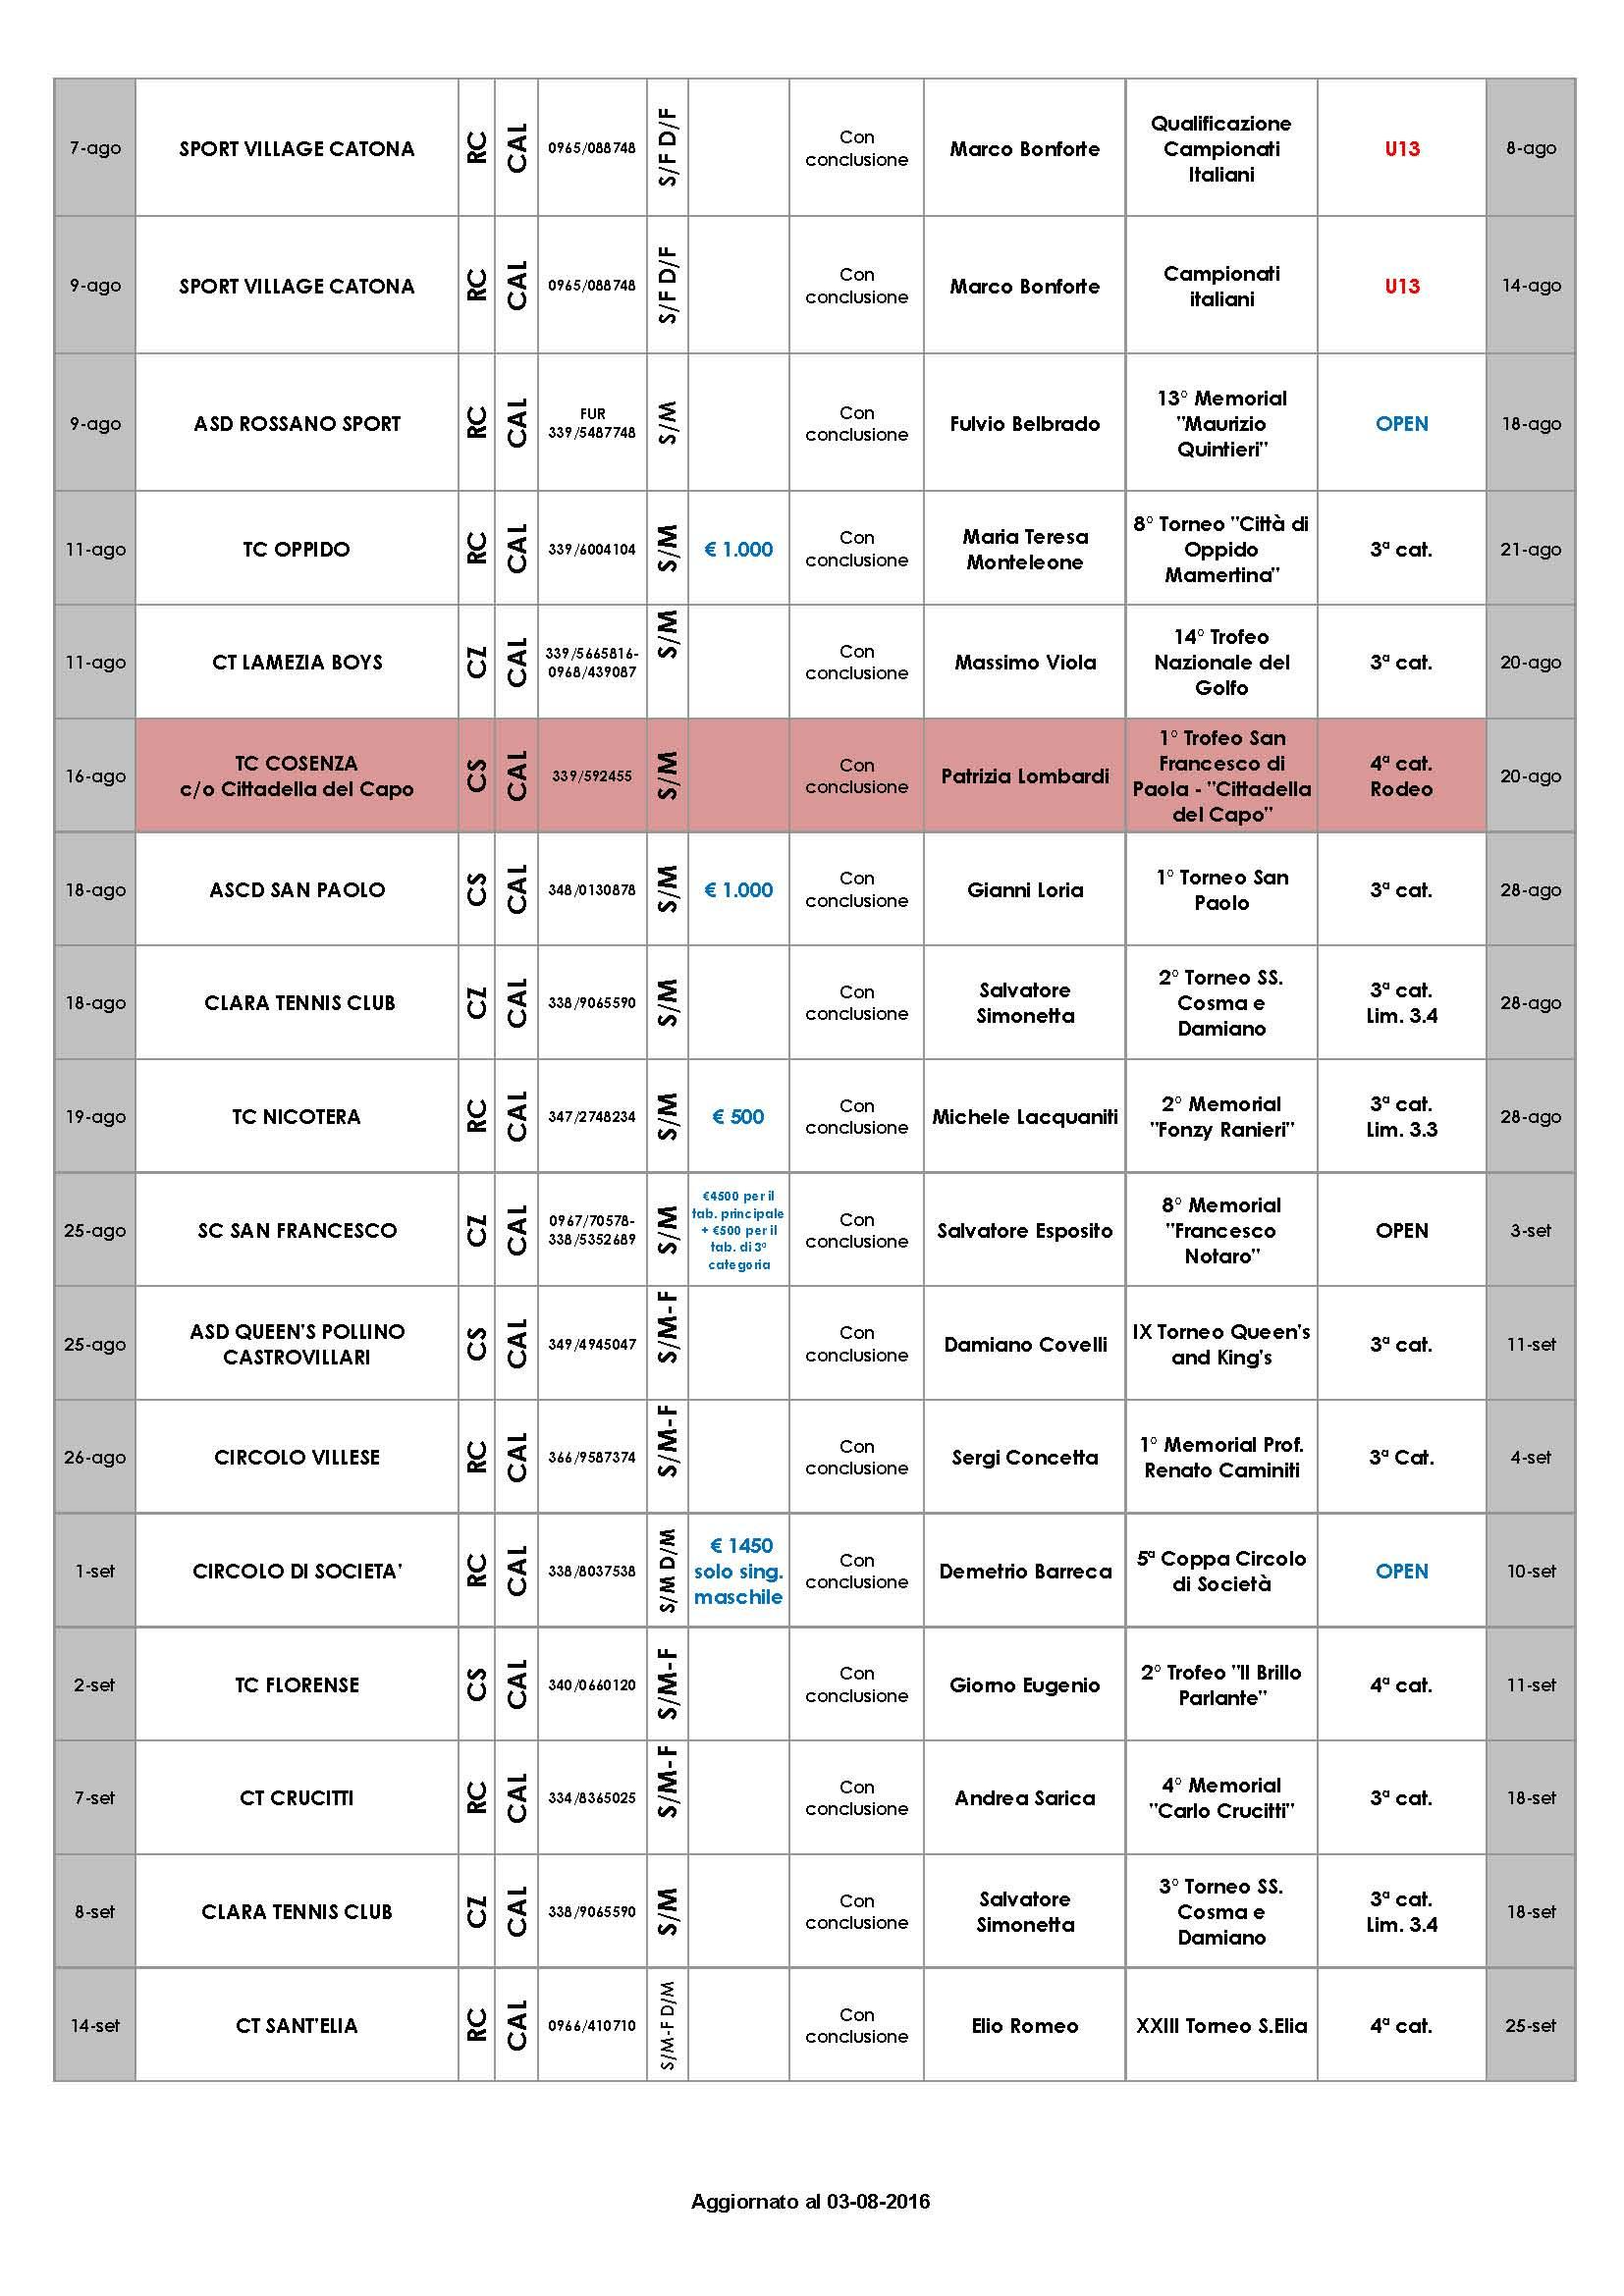 calendario tornei calabria 2016 - agg. 03.08.2016_Pagina_5